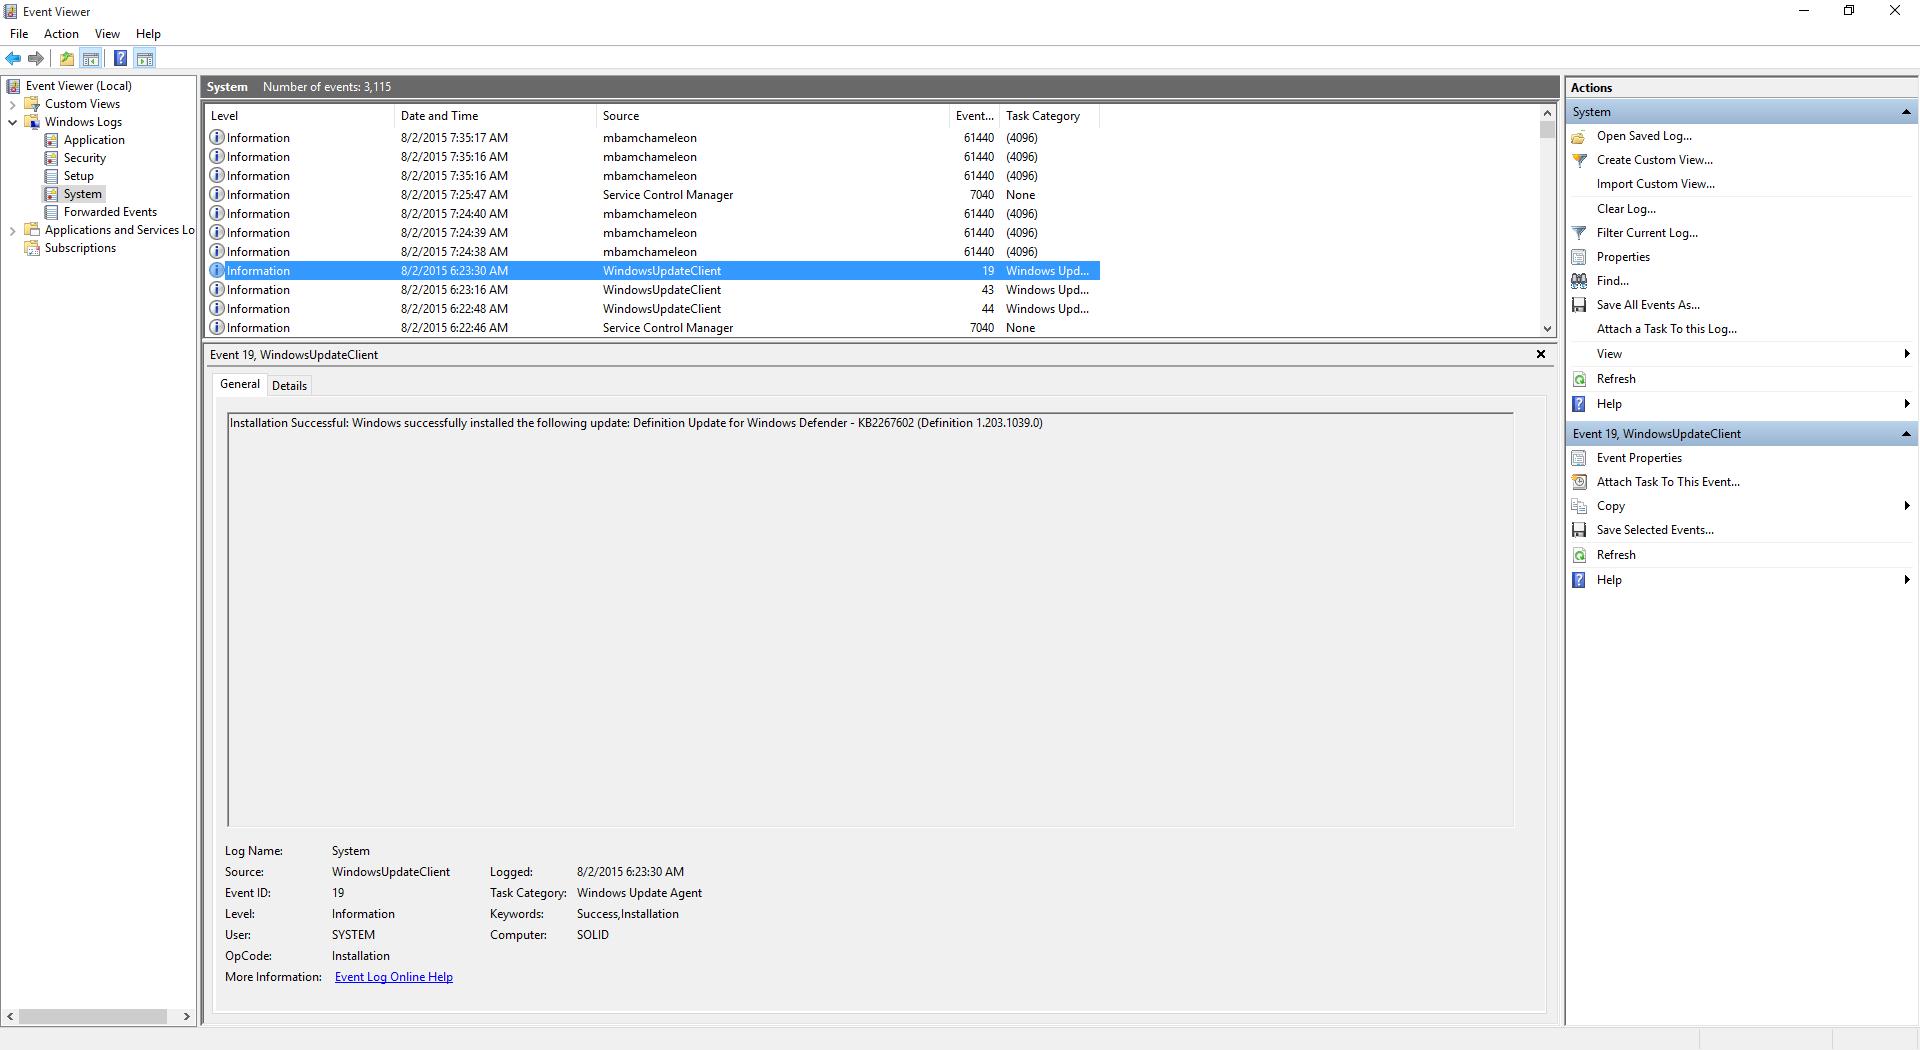 eventviewer-windowsupdate.png